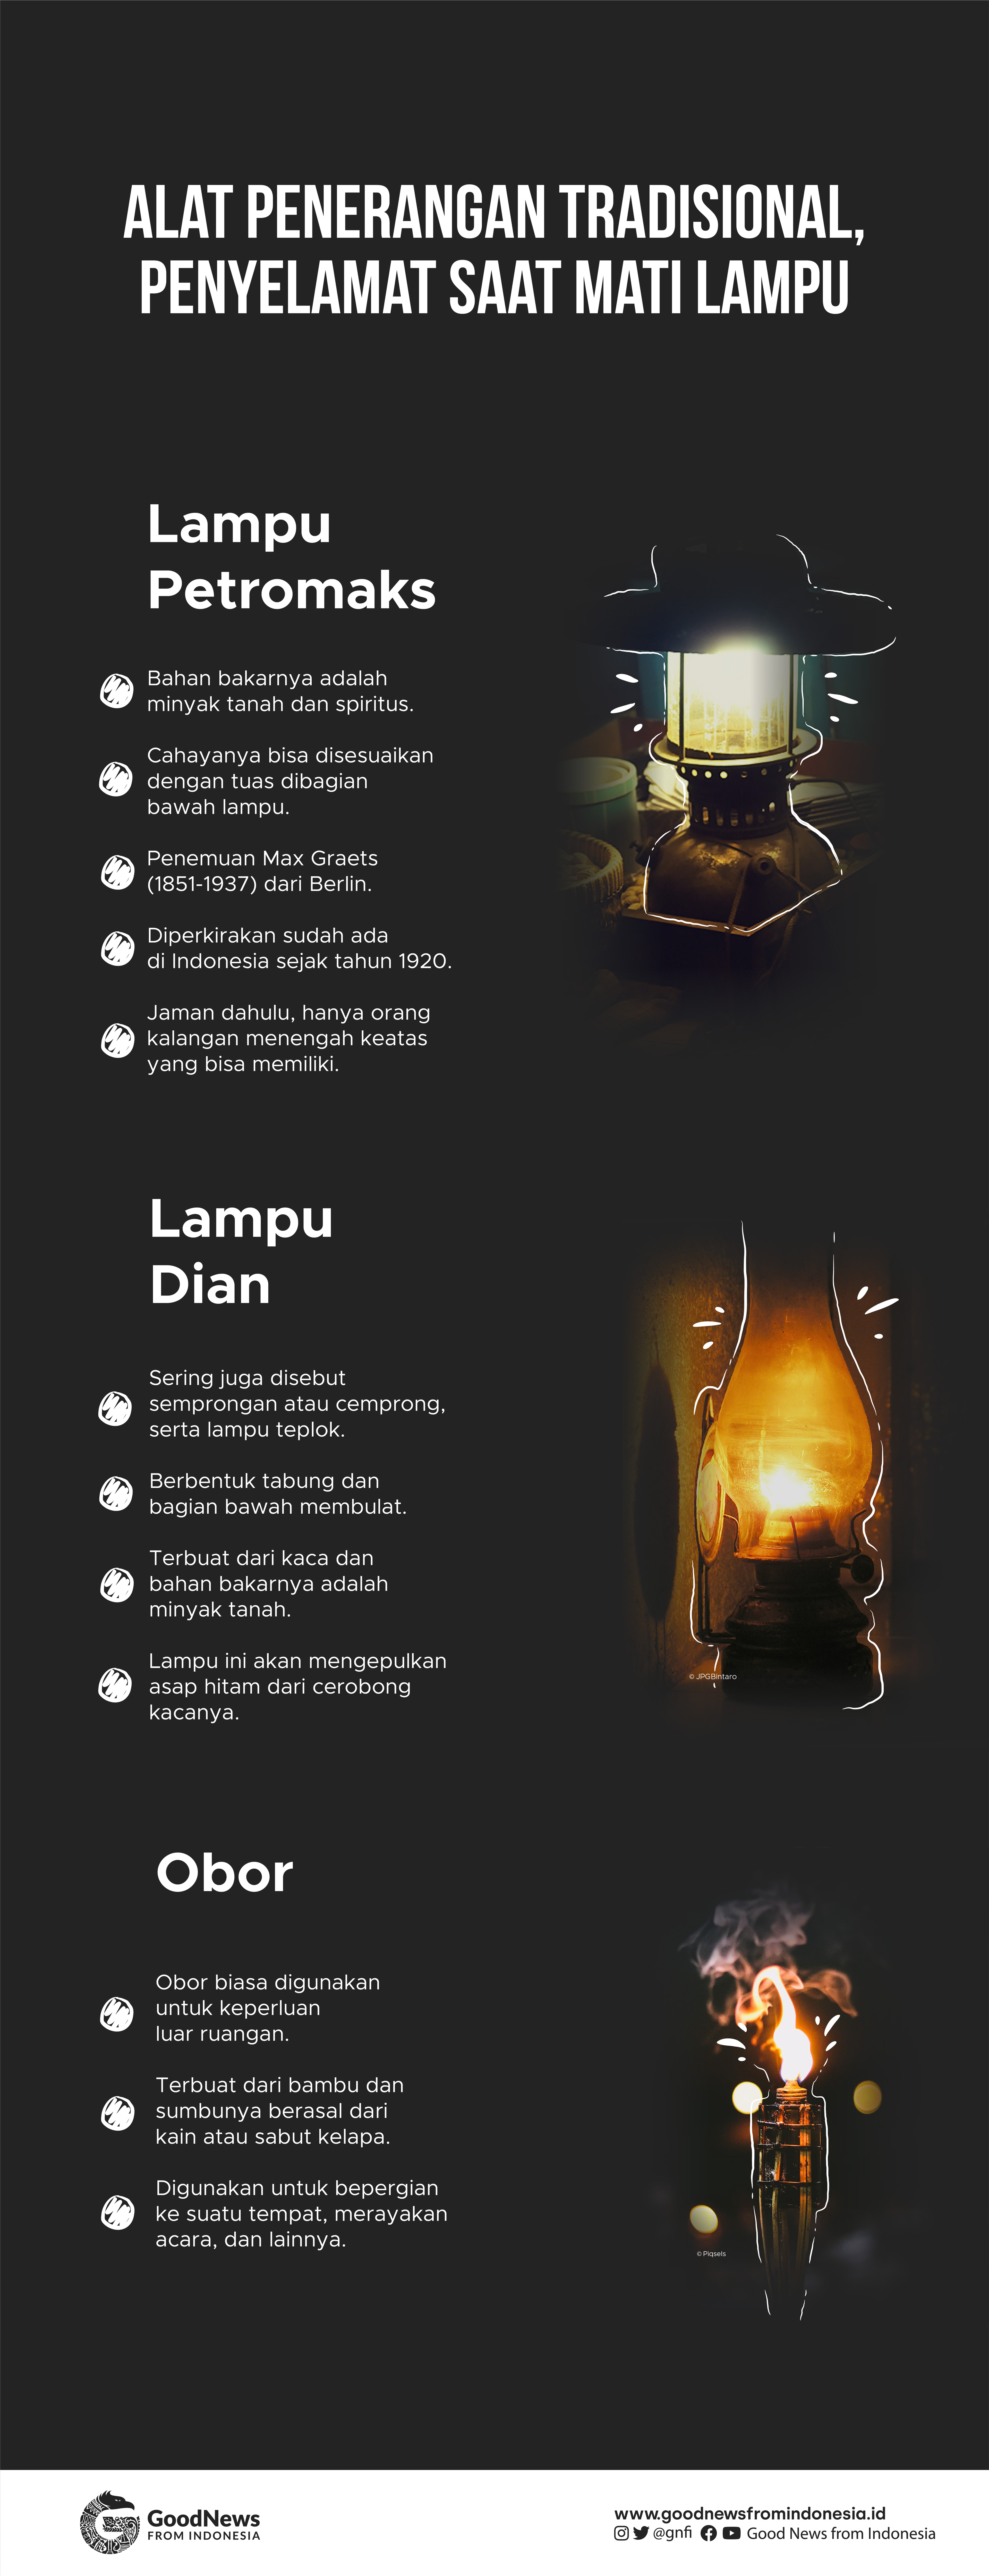 Mengenal Alat Penerangan Tradisional Indonesia